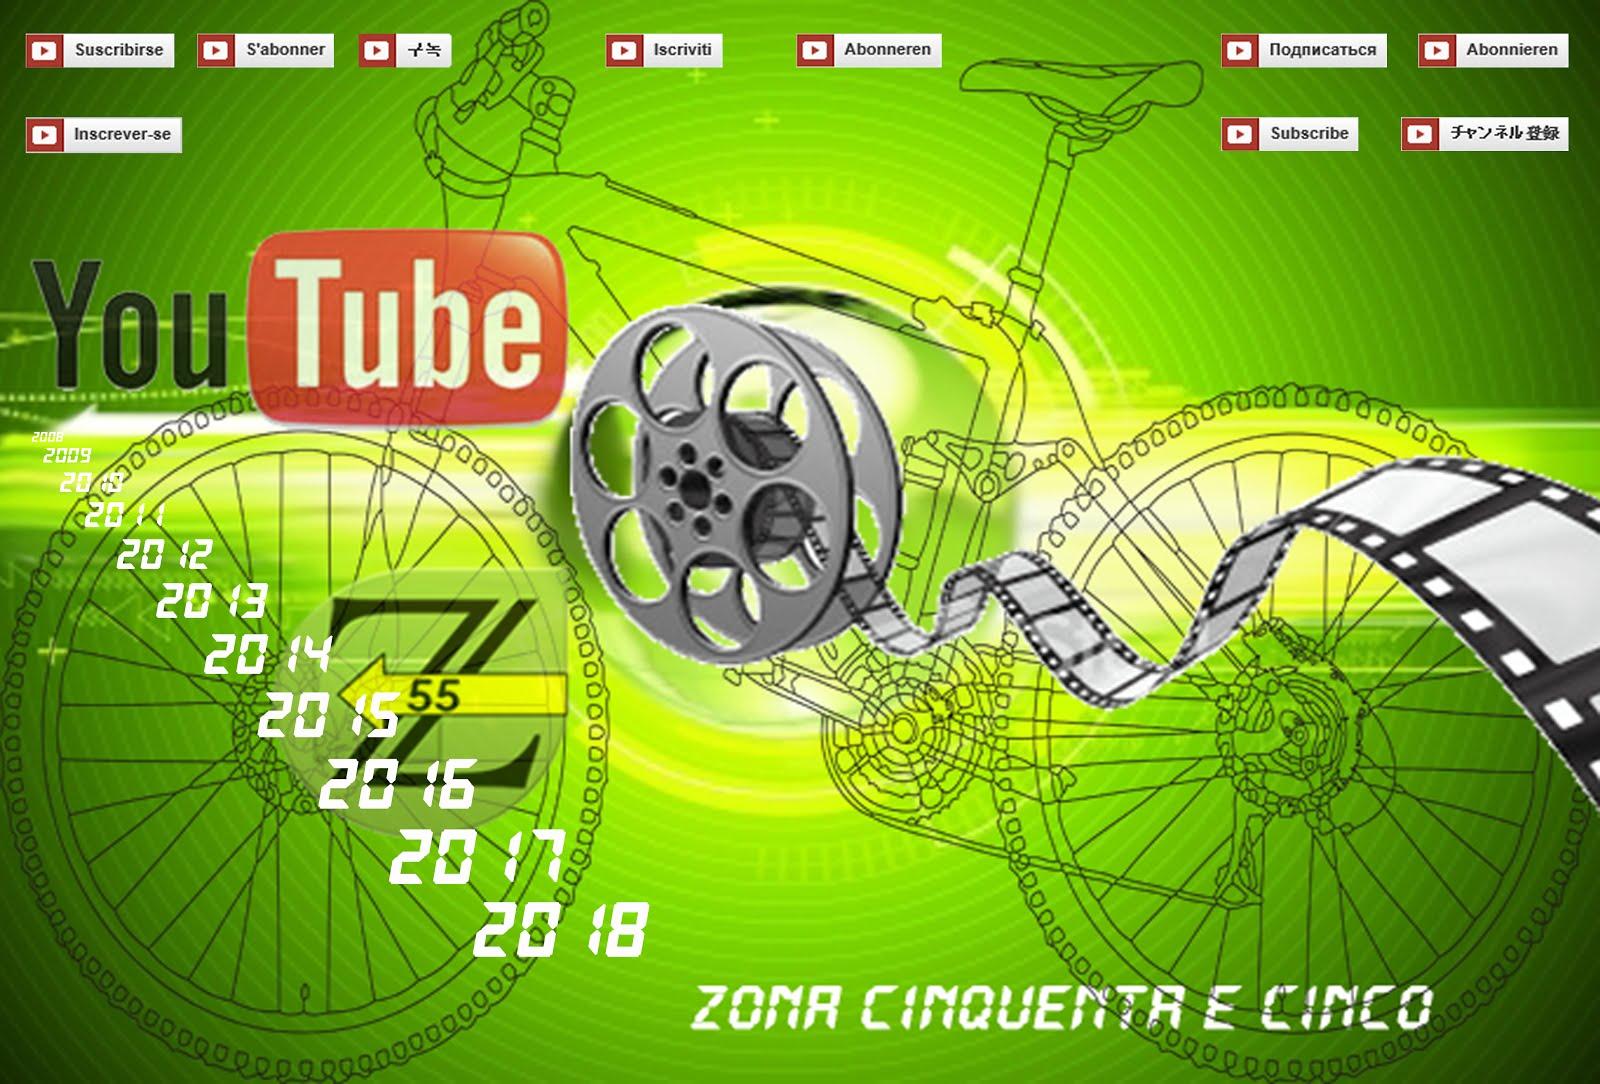 Subscreva / Subscribe